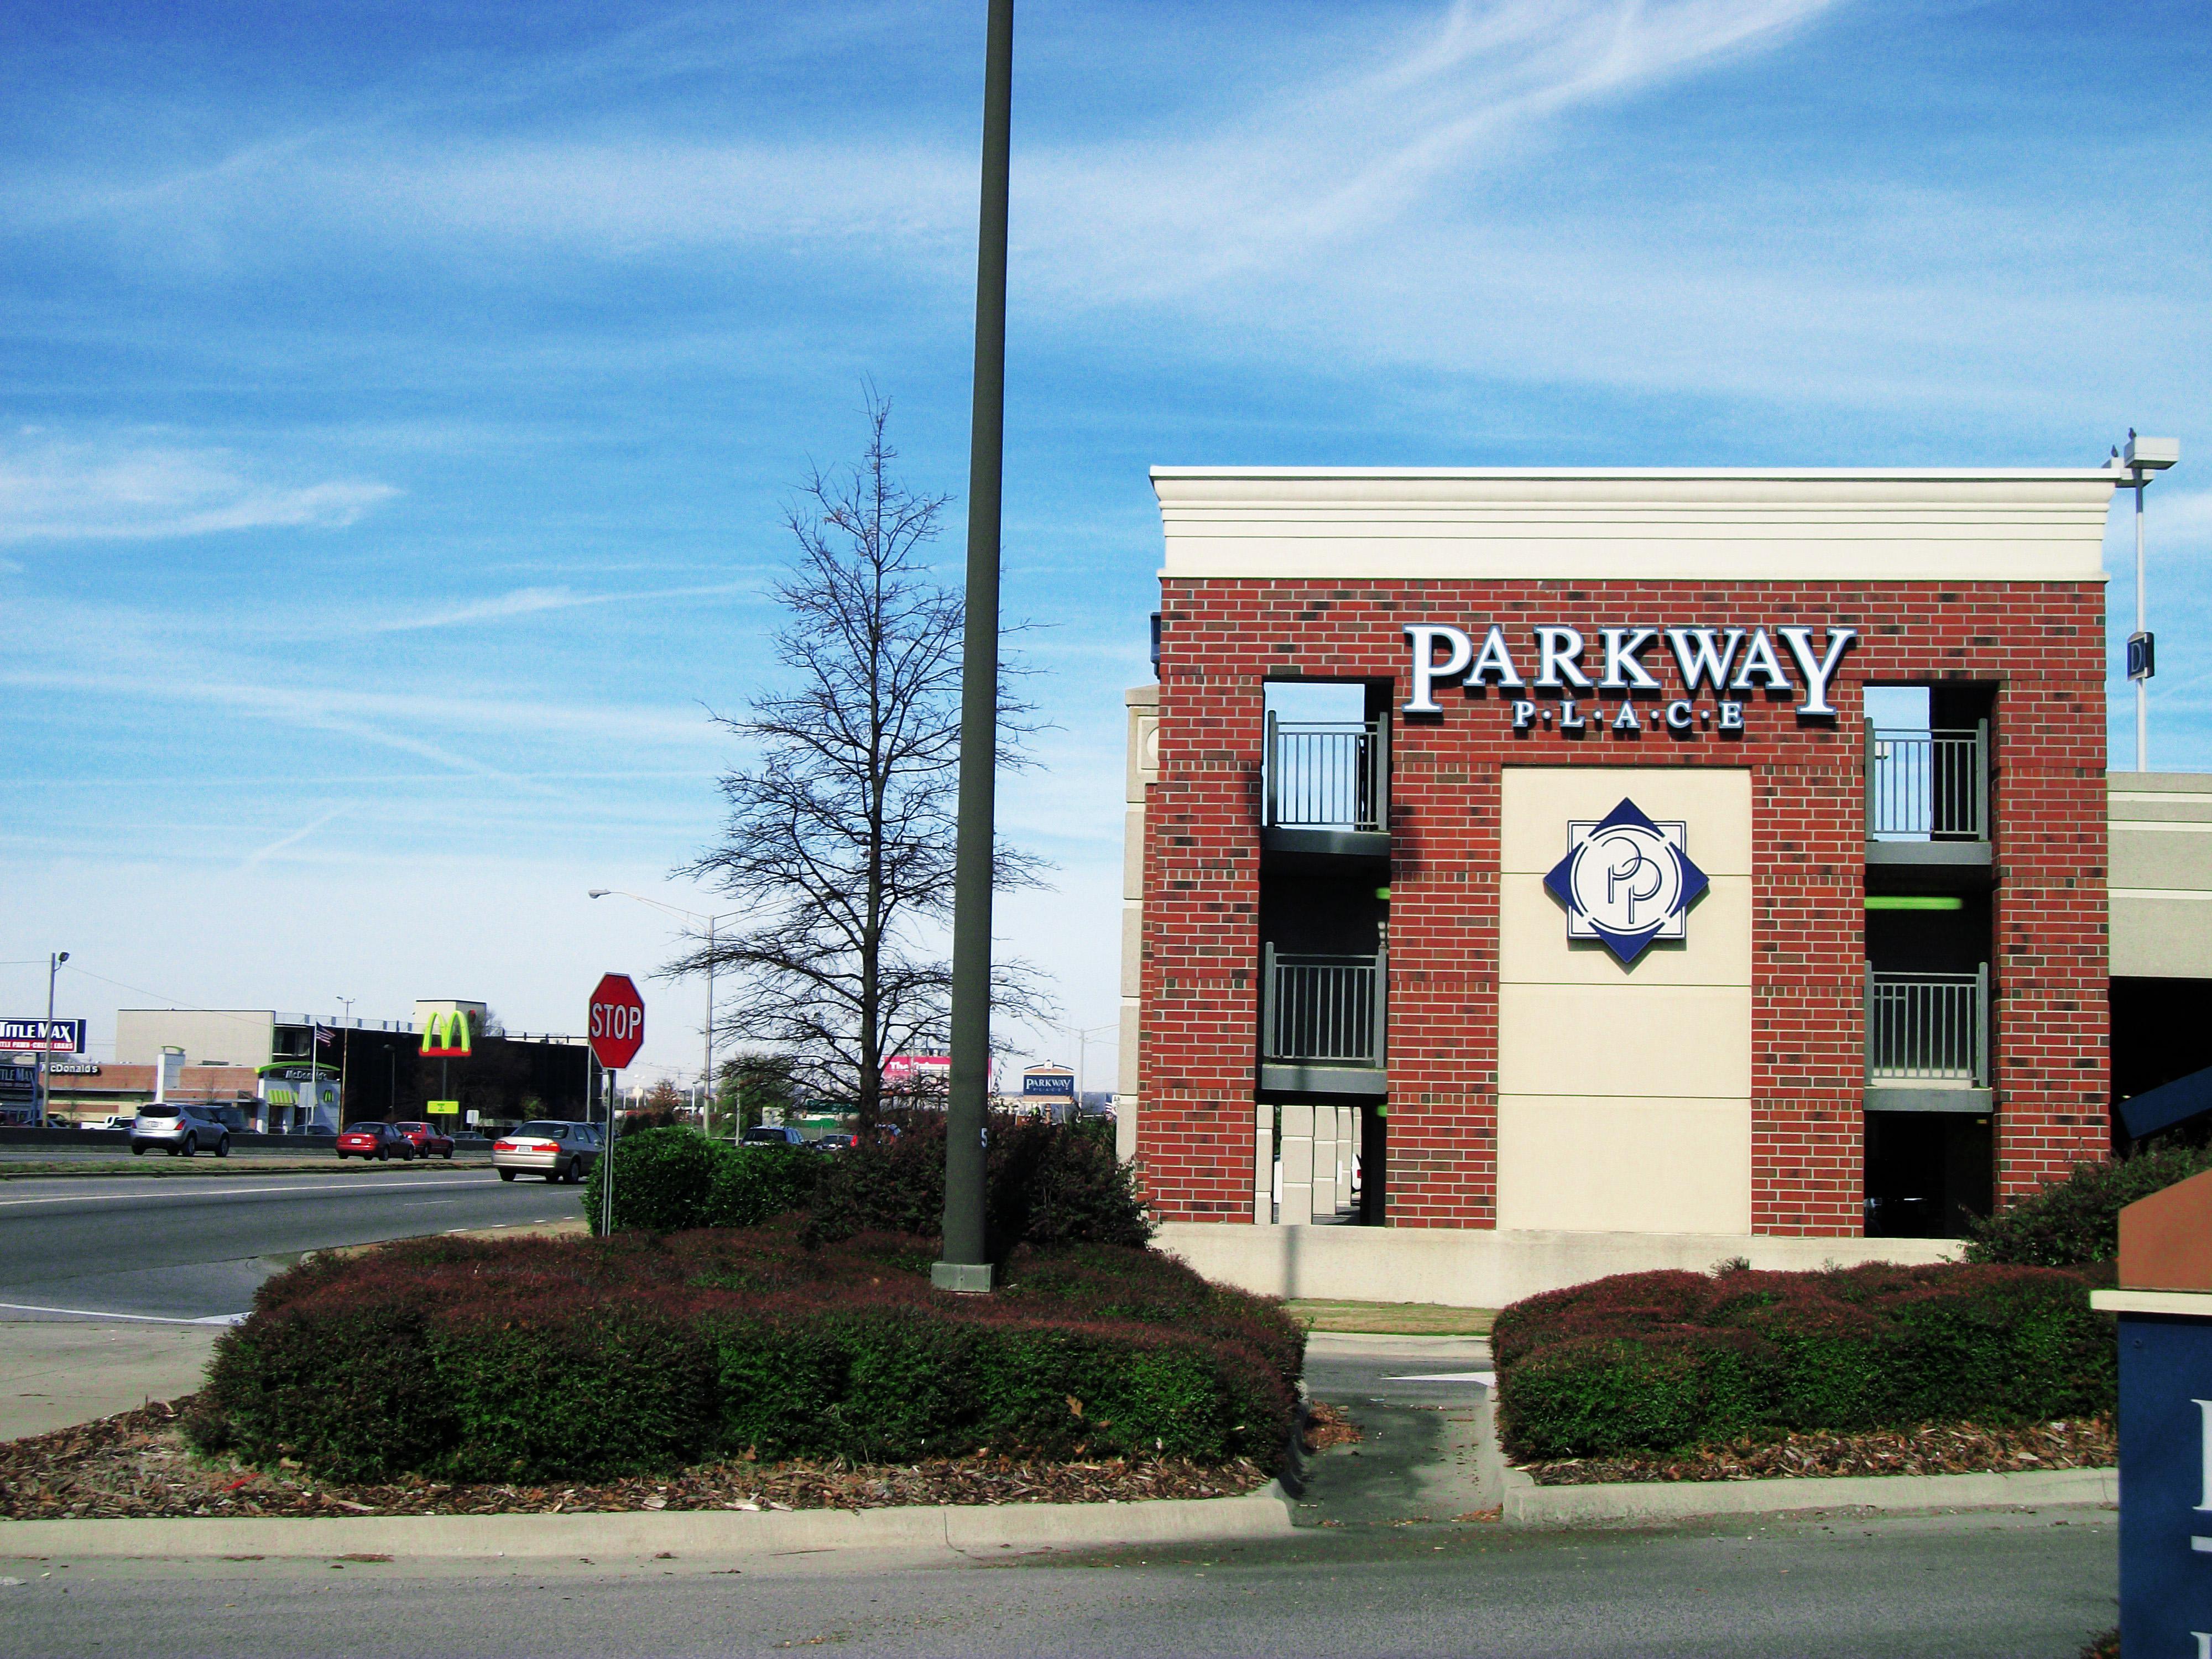 parkway place 2801 memorial parkway sw huntsville al. Black Bedroom Furniture Sets. Home Design Ideas